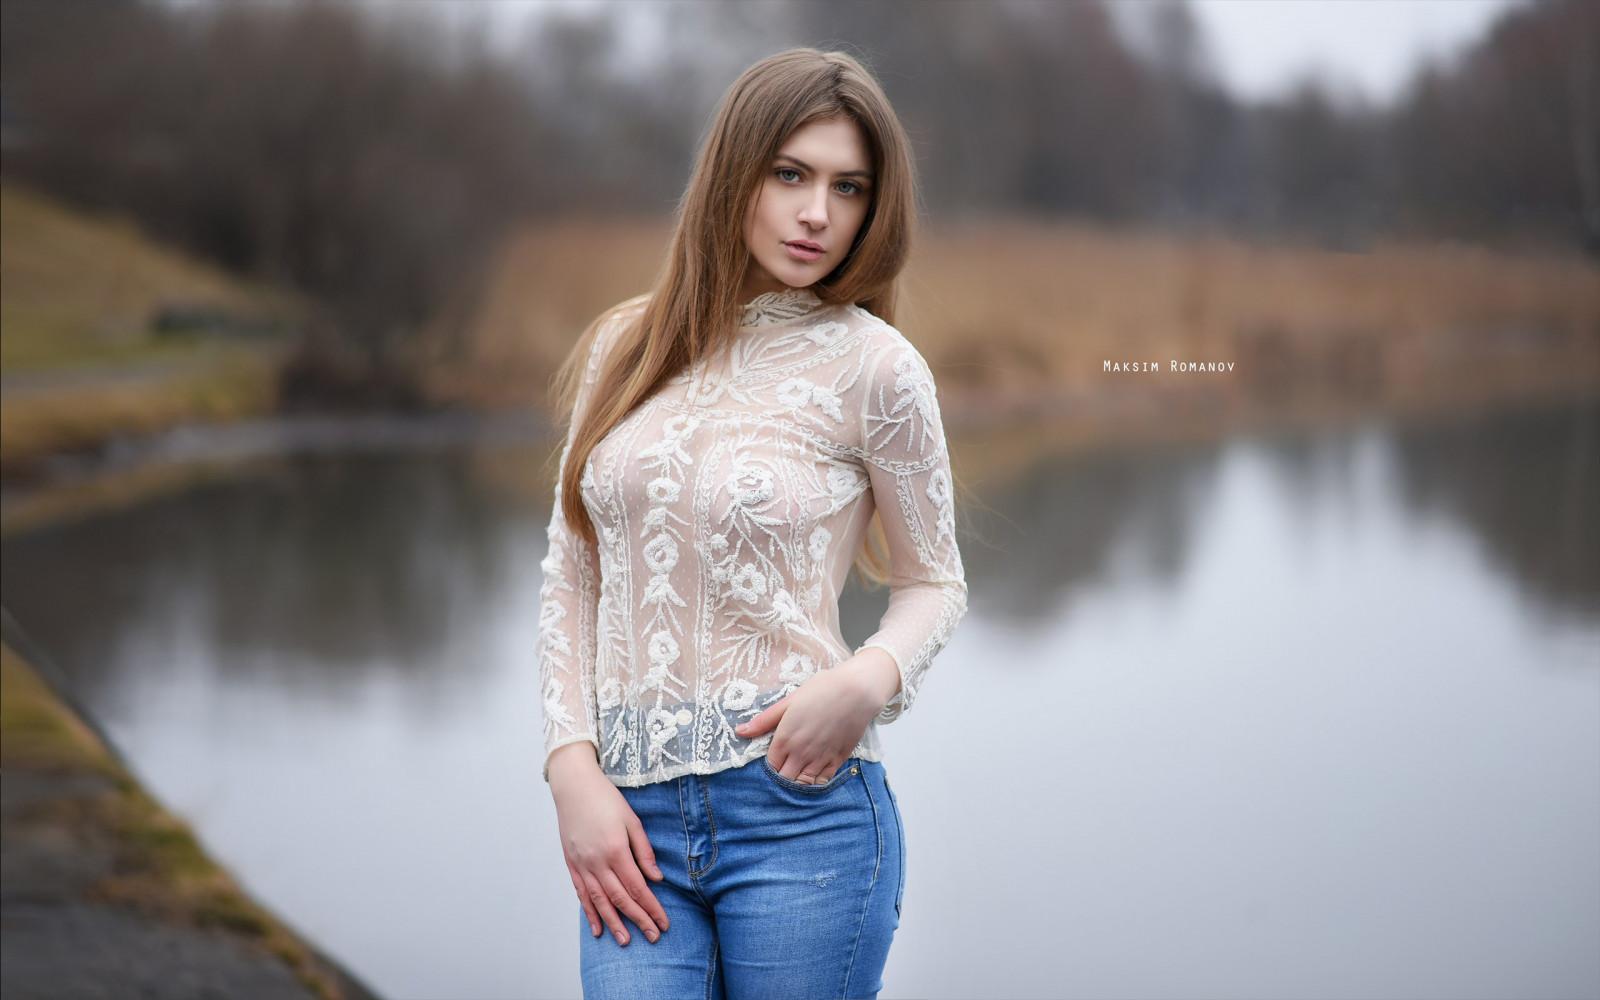 Wallpaper  Blonde, Portrait, Lake, Women Outdoors, See -4246